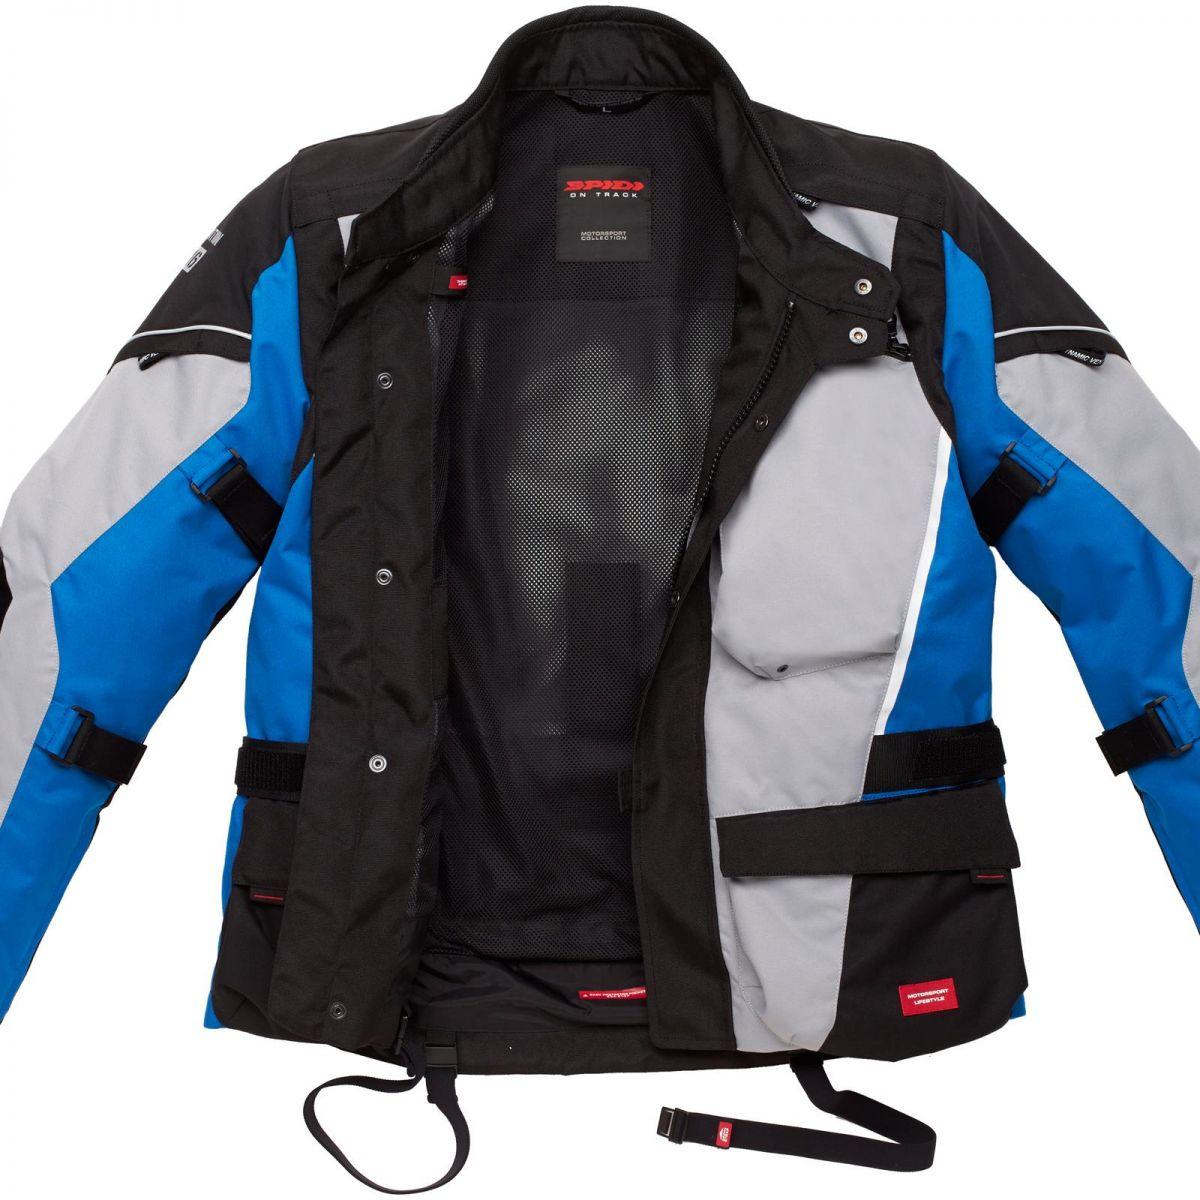 Jaqueta Spidi Voyager 3 H2Out Dark/ Grey/Blue ( Big Trail - Parka ) - SUPEROFERTA!  - Nova Centro Boutique Roupas para Motociclistas